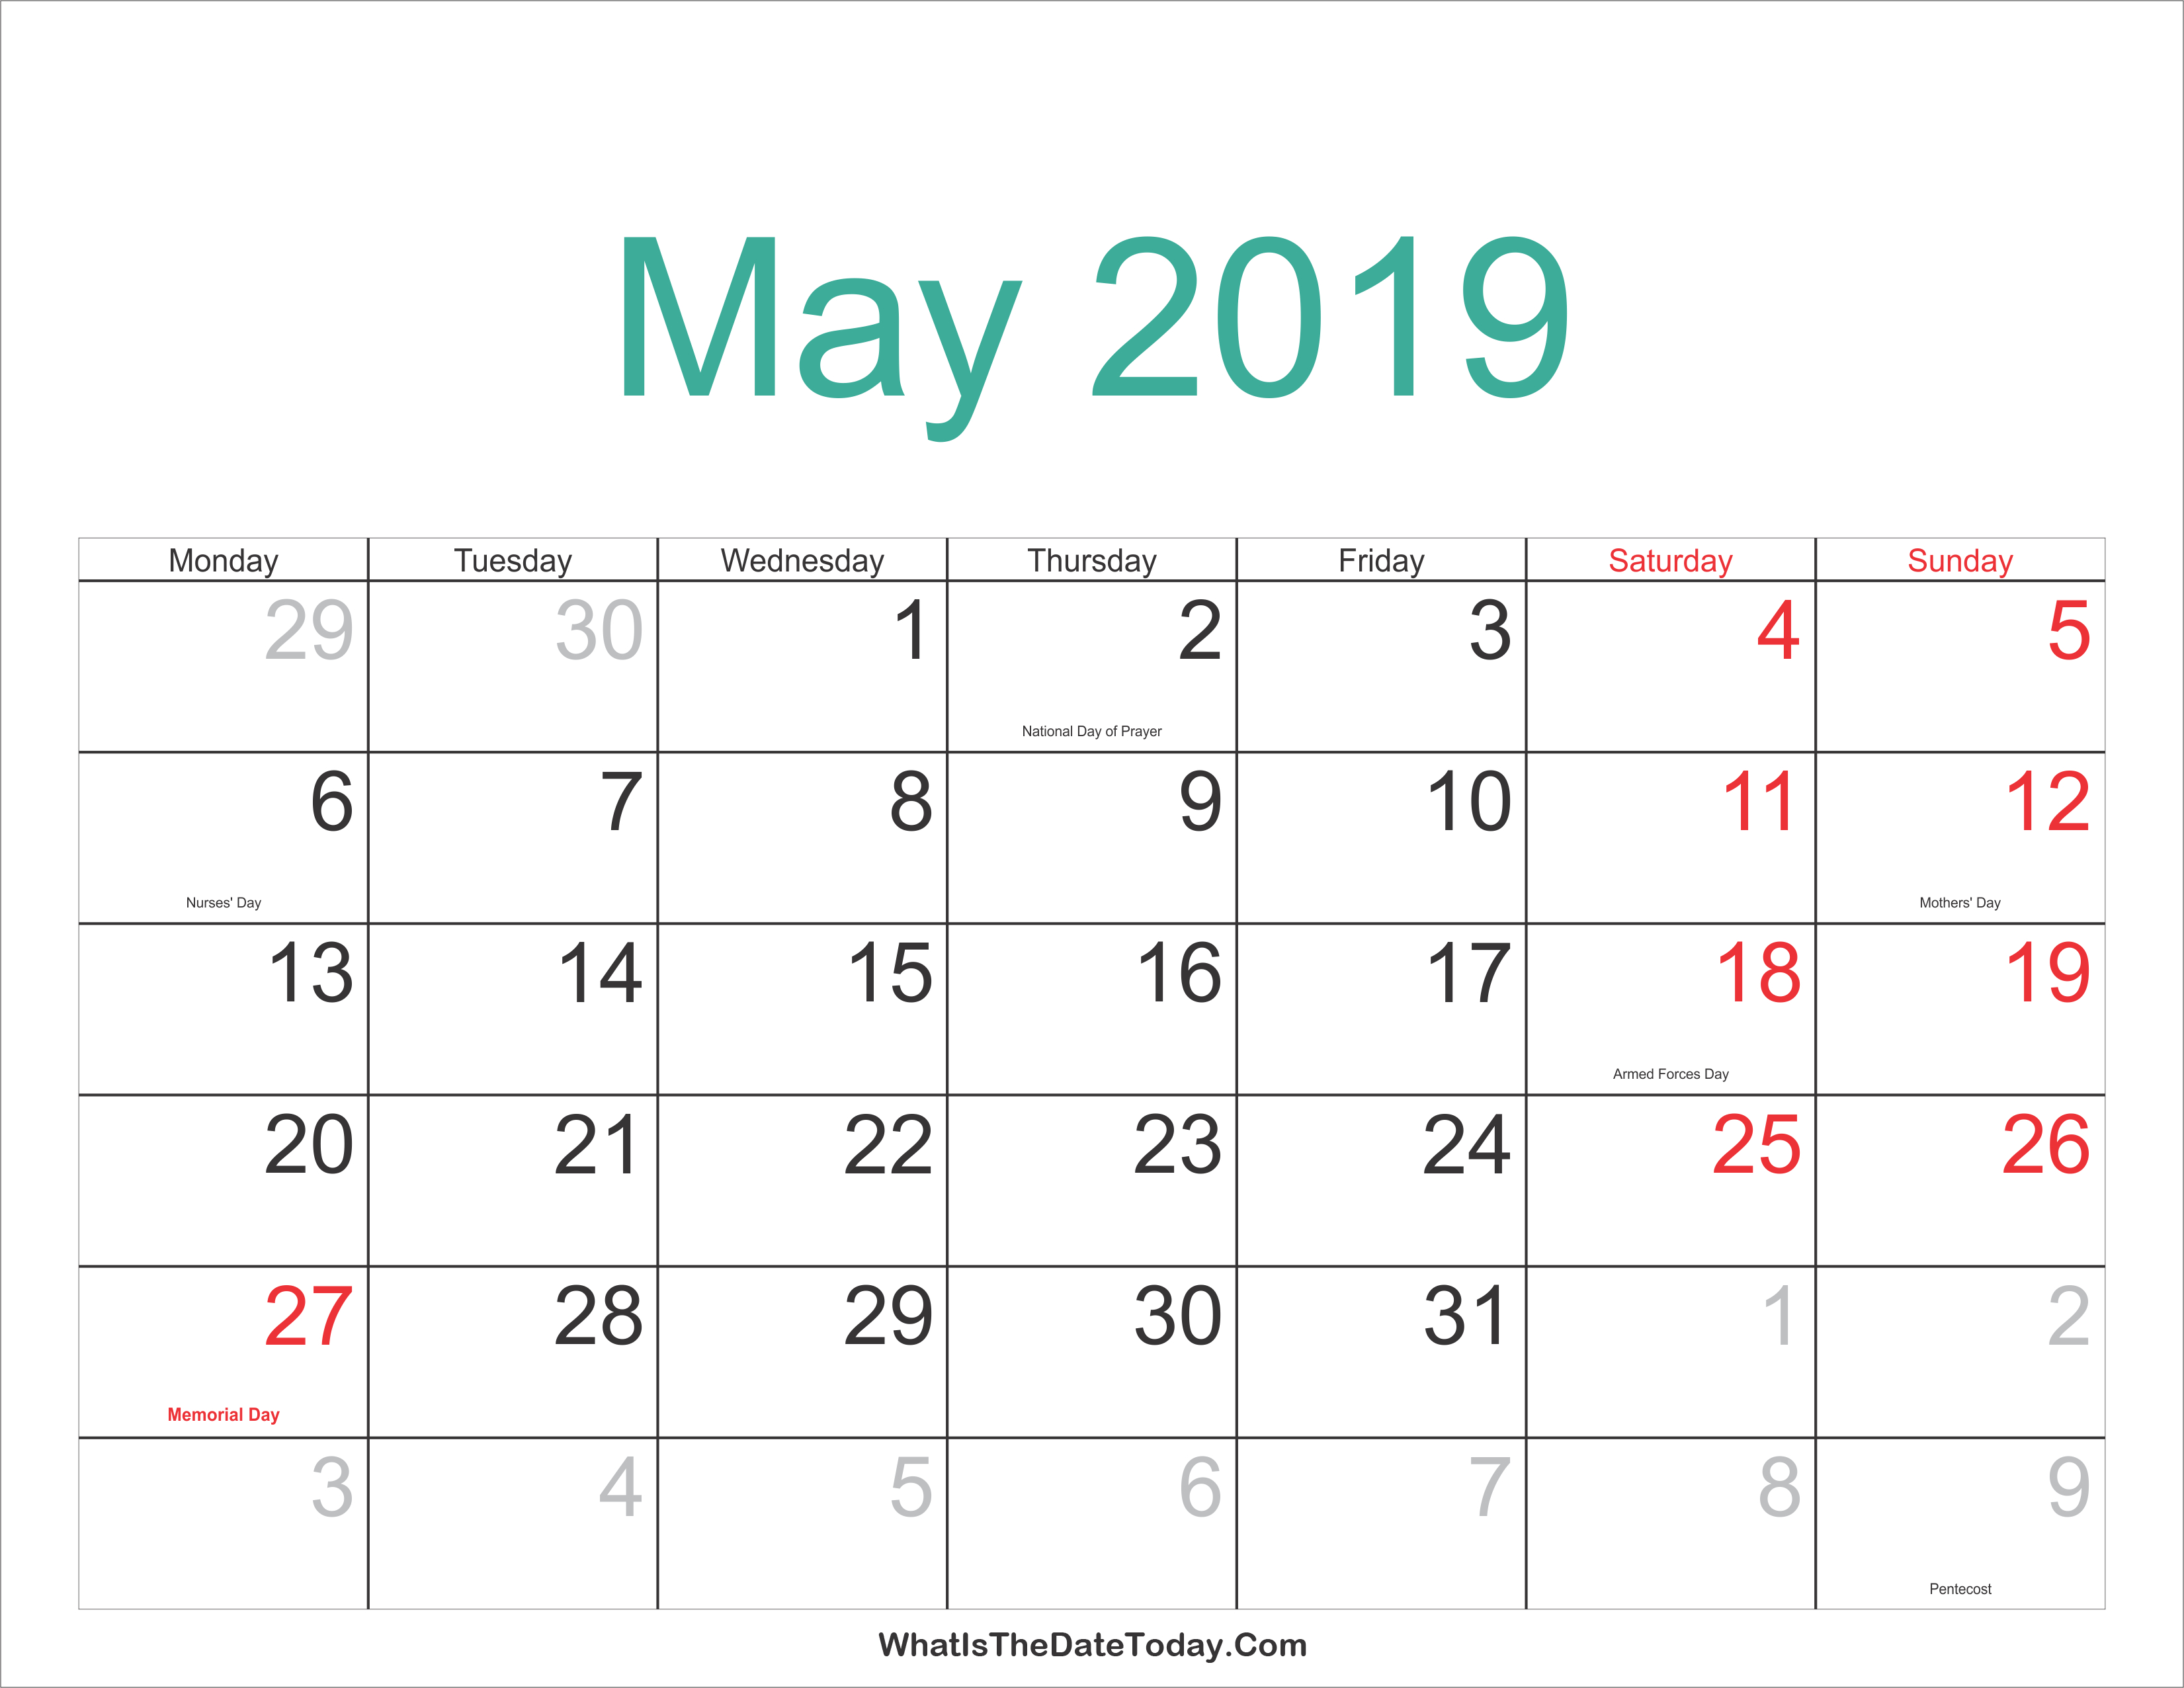 May 2019 Calendar With Holidays - Free Printable Calendar, Templates May 8 2019 Calendar